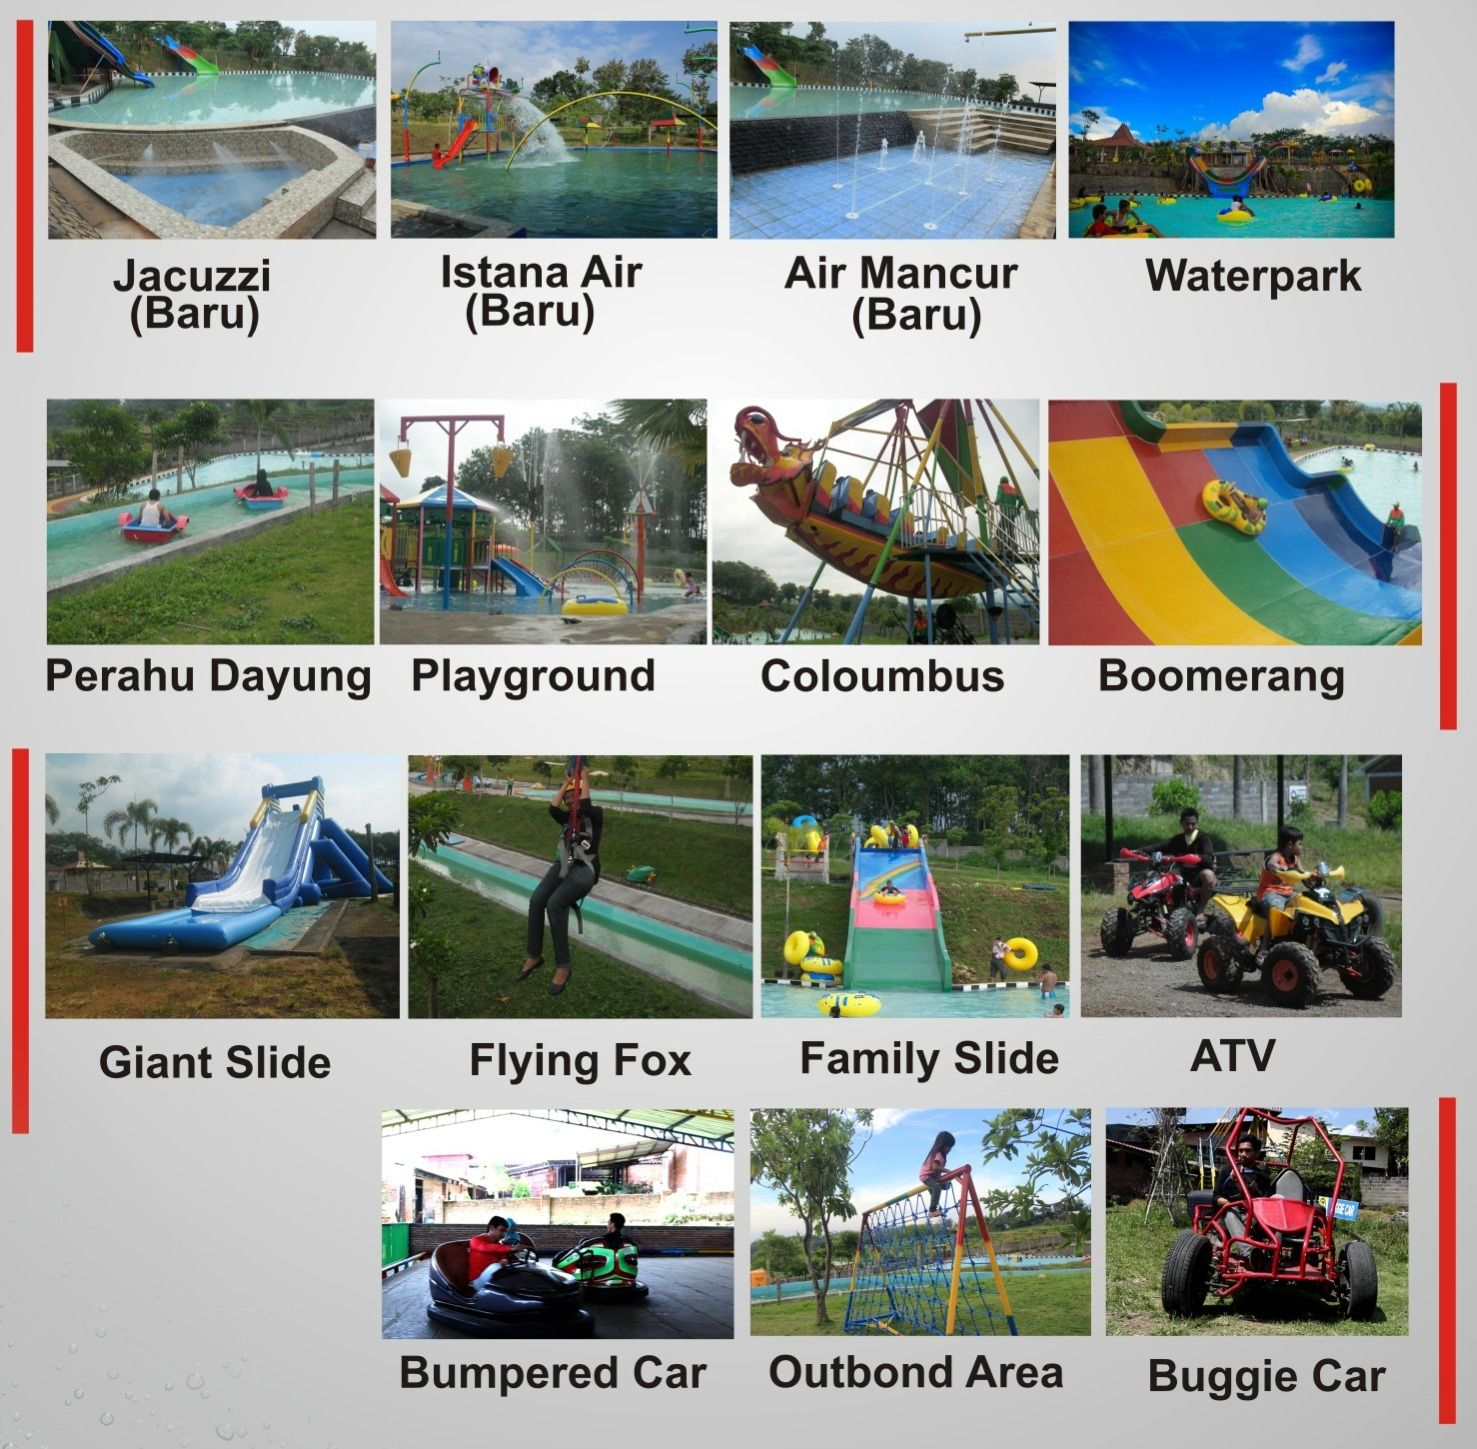 Tempat Obyek Wisata Joglo Park Pacet Air Terlengkap Mojokerto Jawa